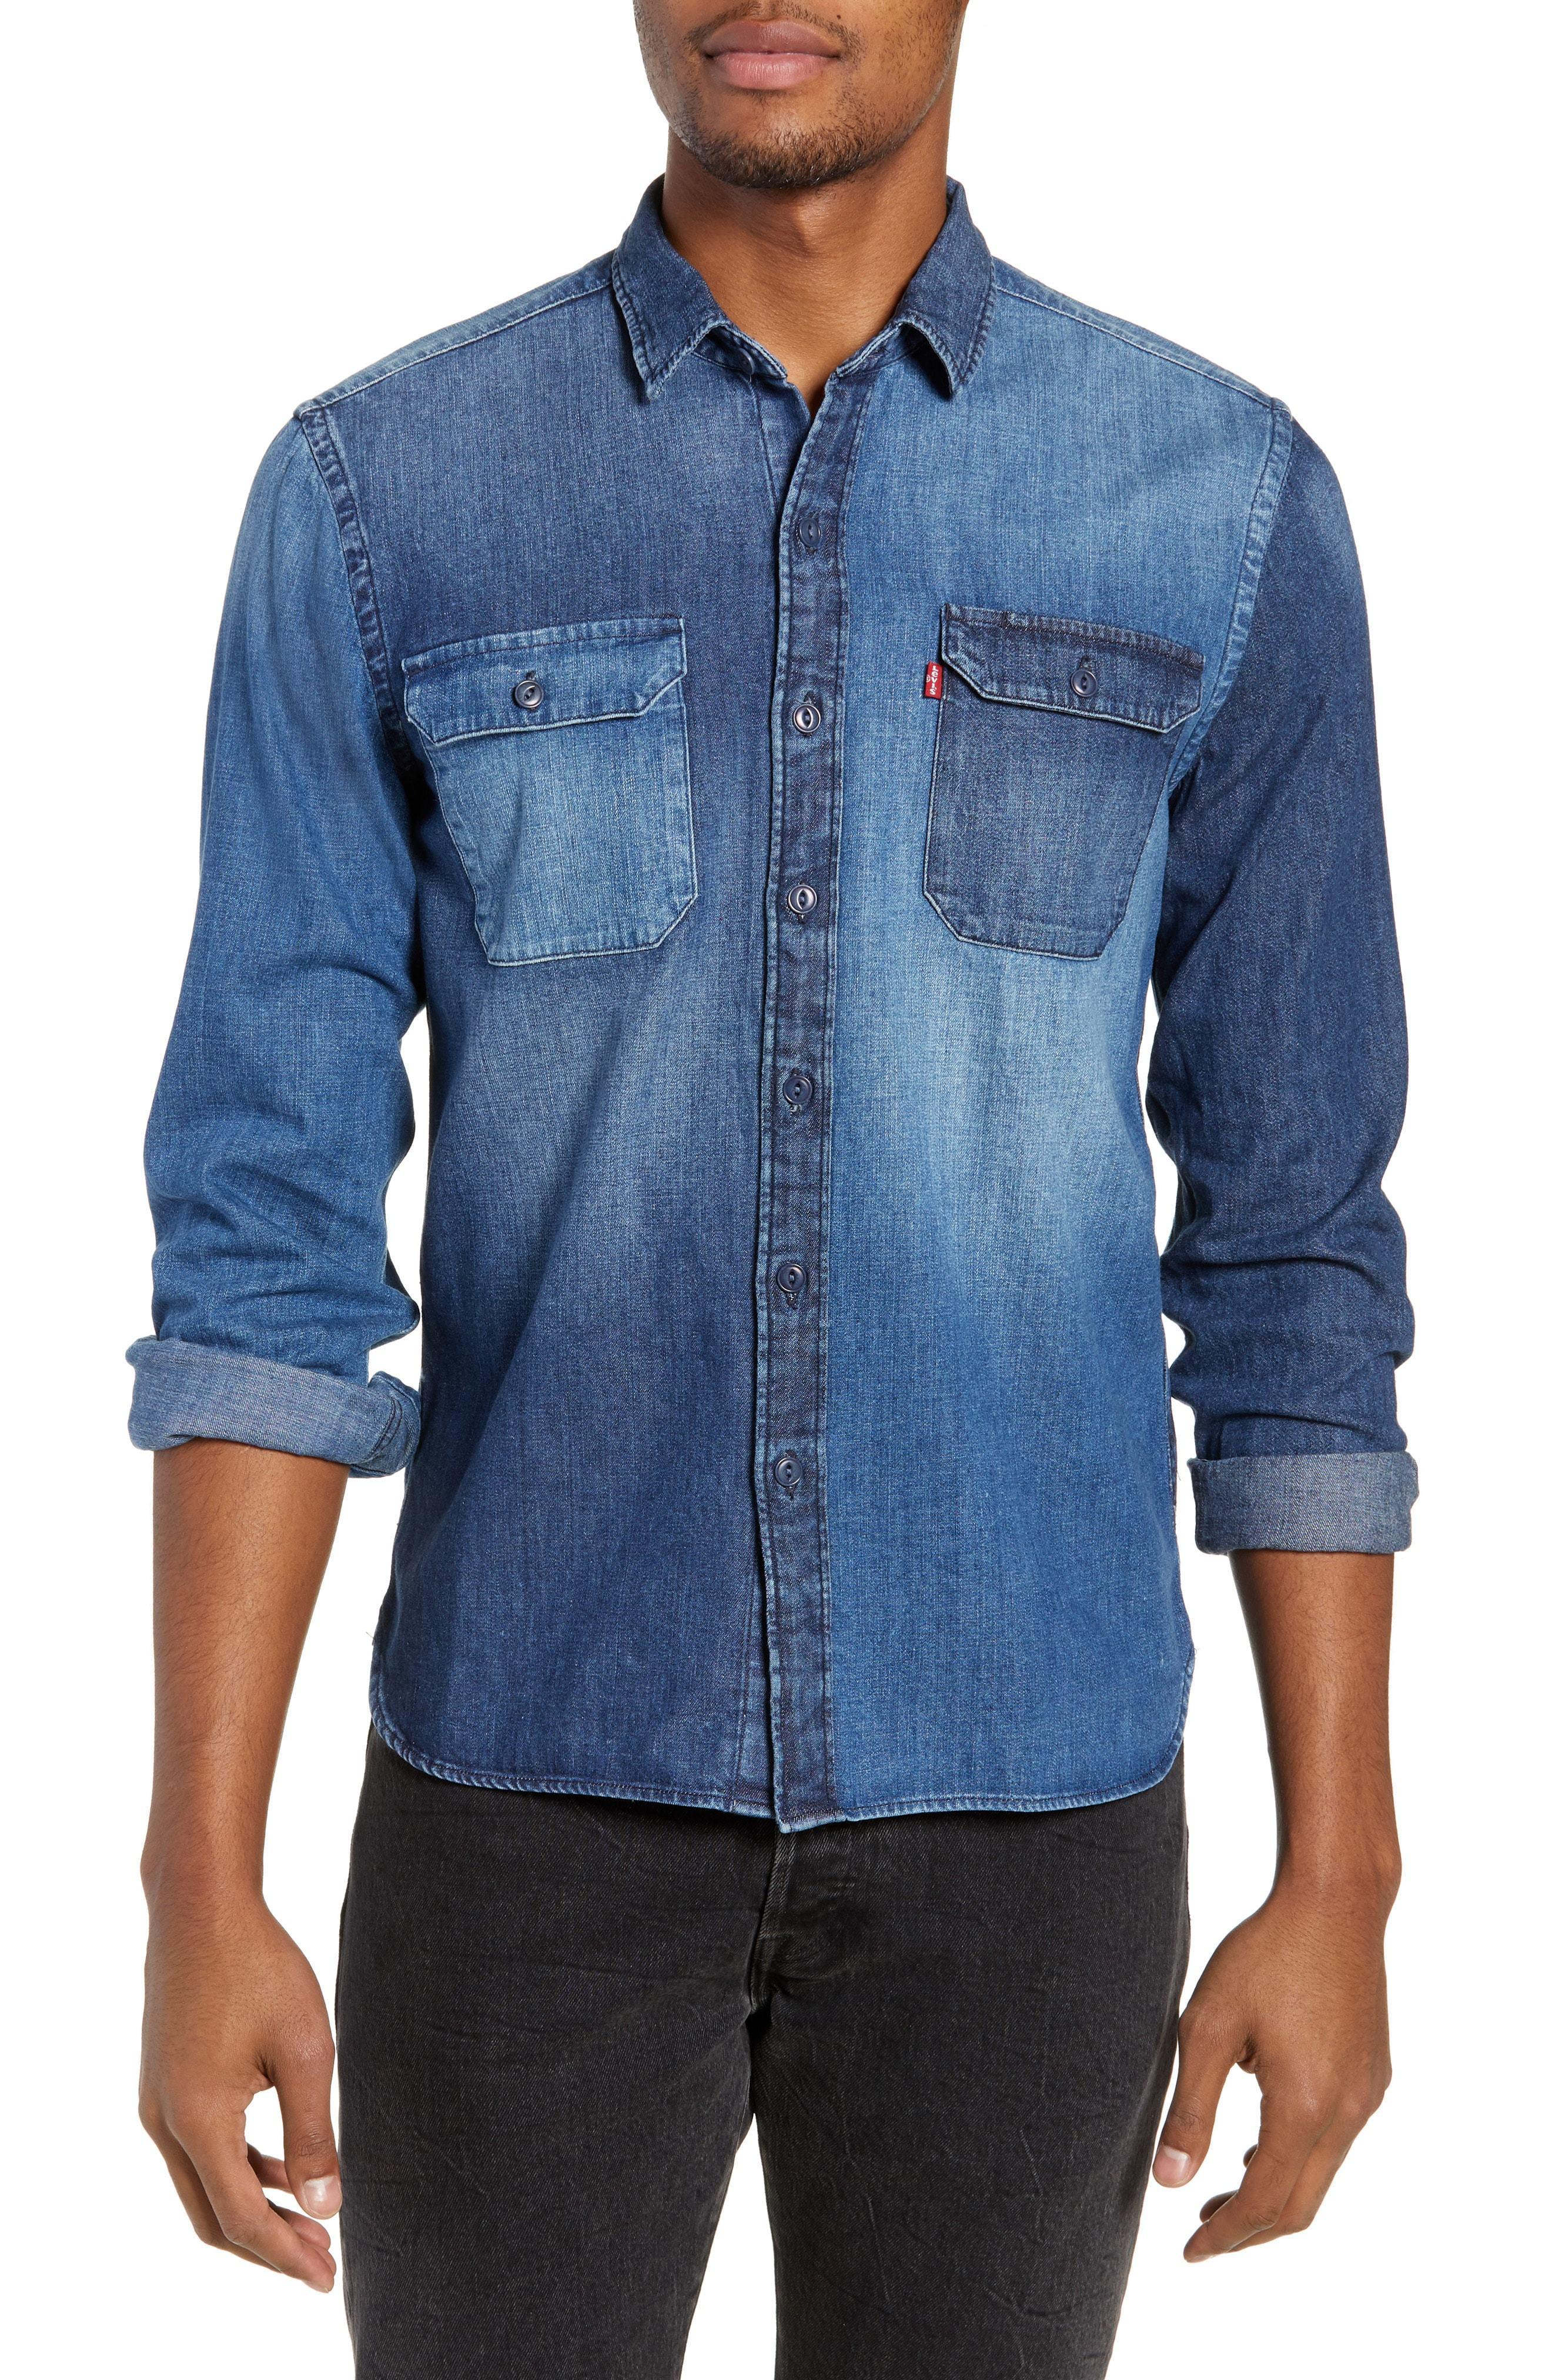 Levi's Jackson Pieced Denim Shirt